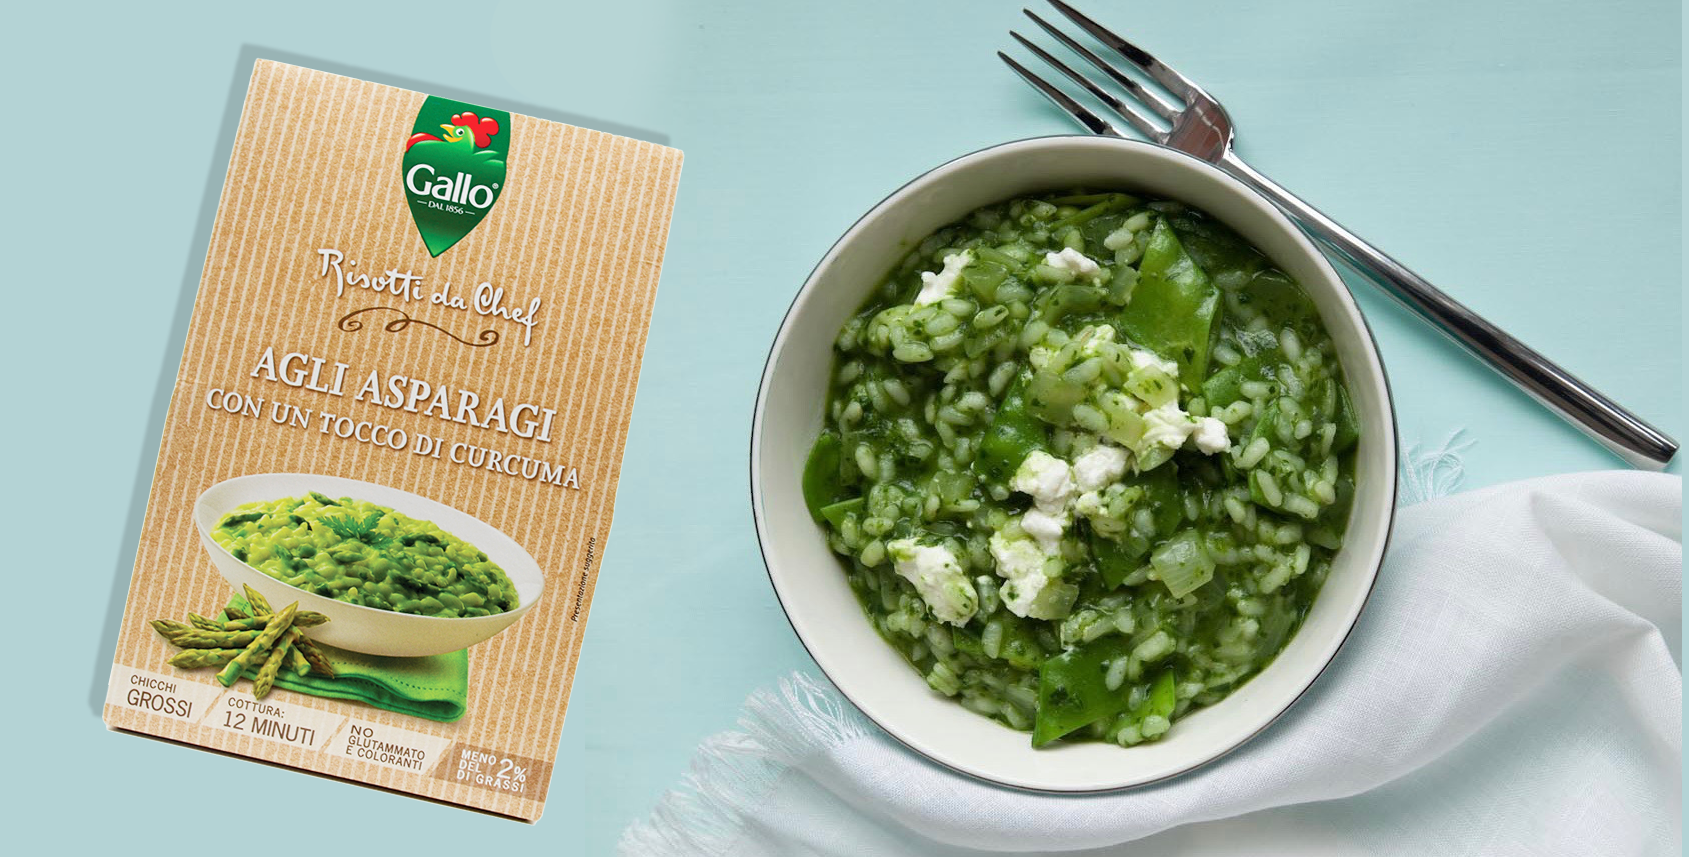 Riso Gallo Risotto špargla - ukusan, zdrav i brz obrok